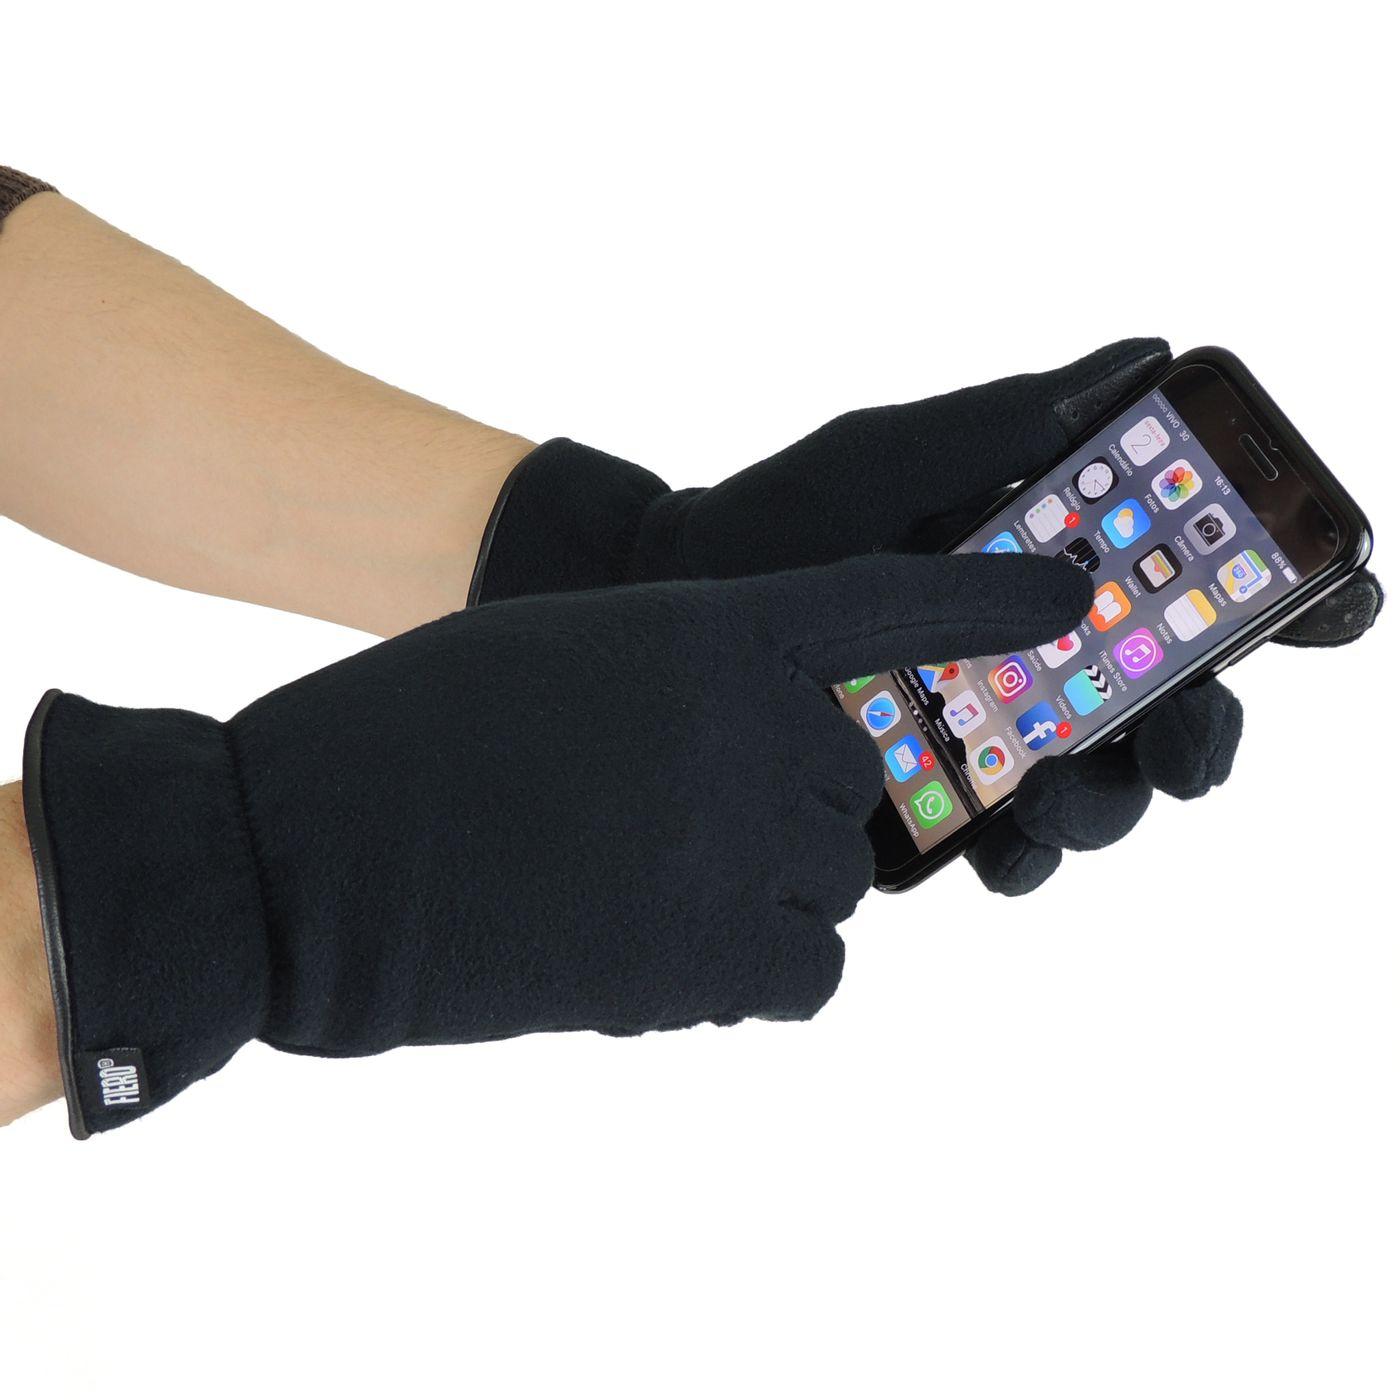 Luva com tecido soft e sistema touch screen - fieroshop 0714d8aa28f